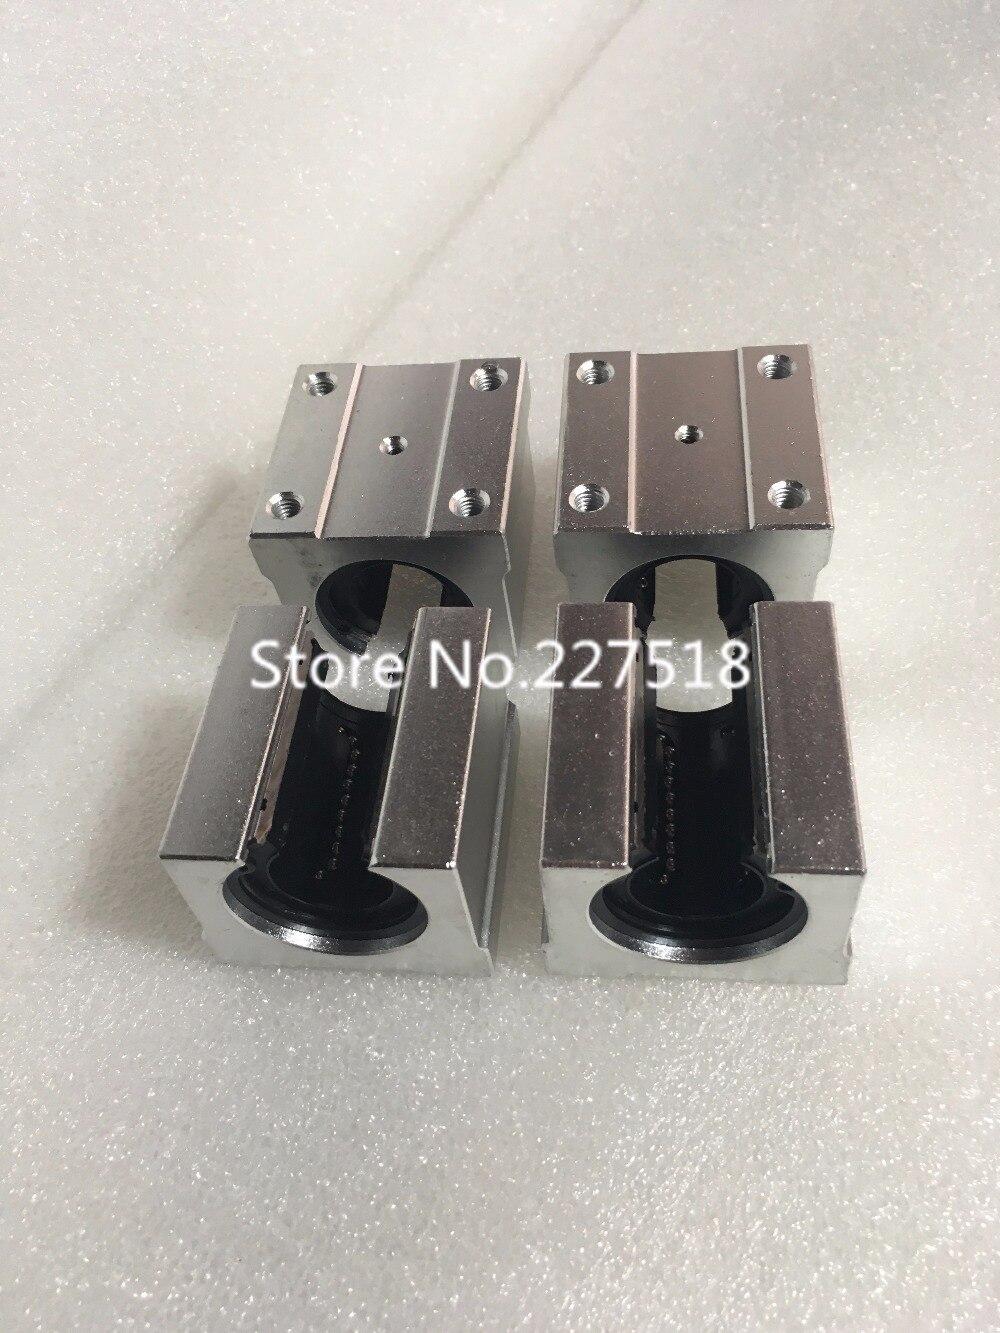 1pcs SBR50UU 50mm Linear motion ball bearing slide block match use SBR50 50mm linear guide rail<br>